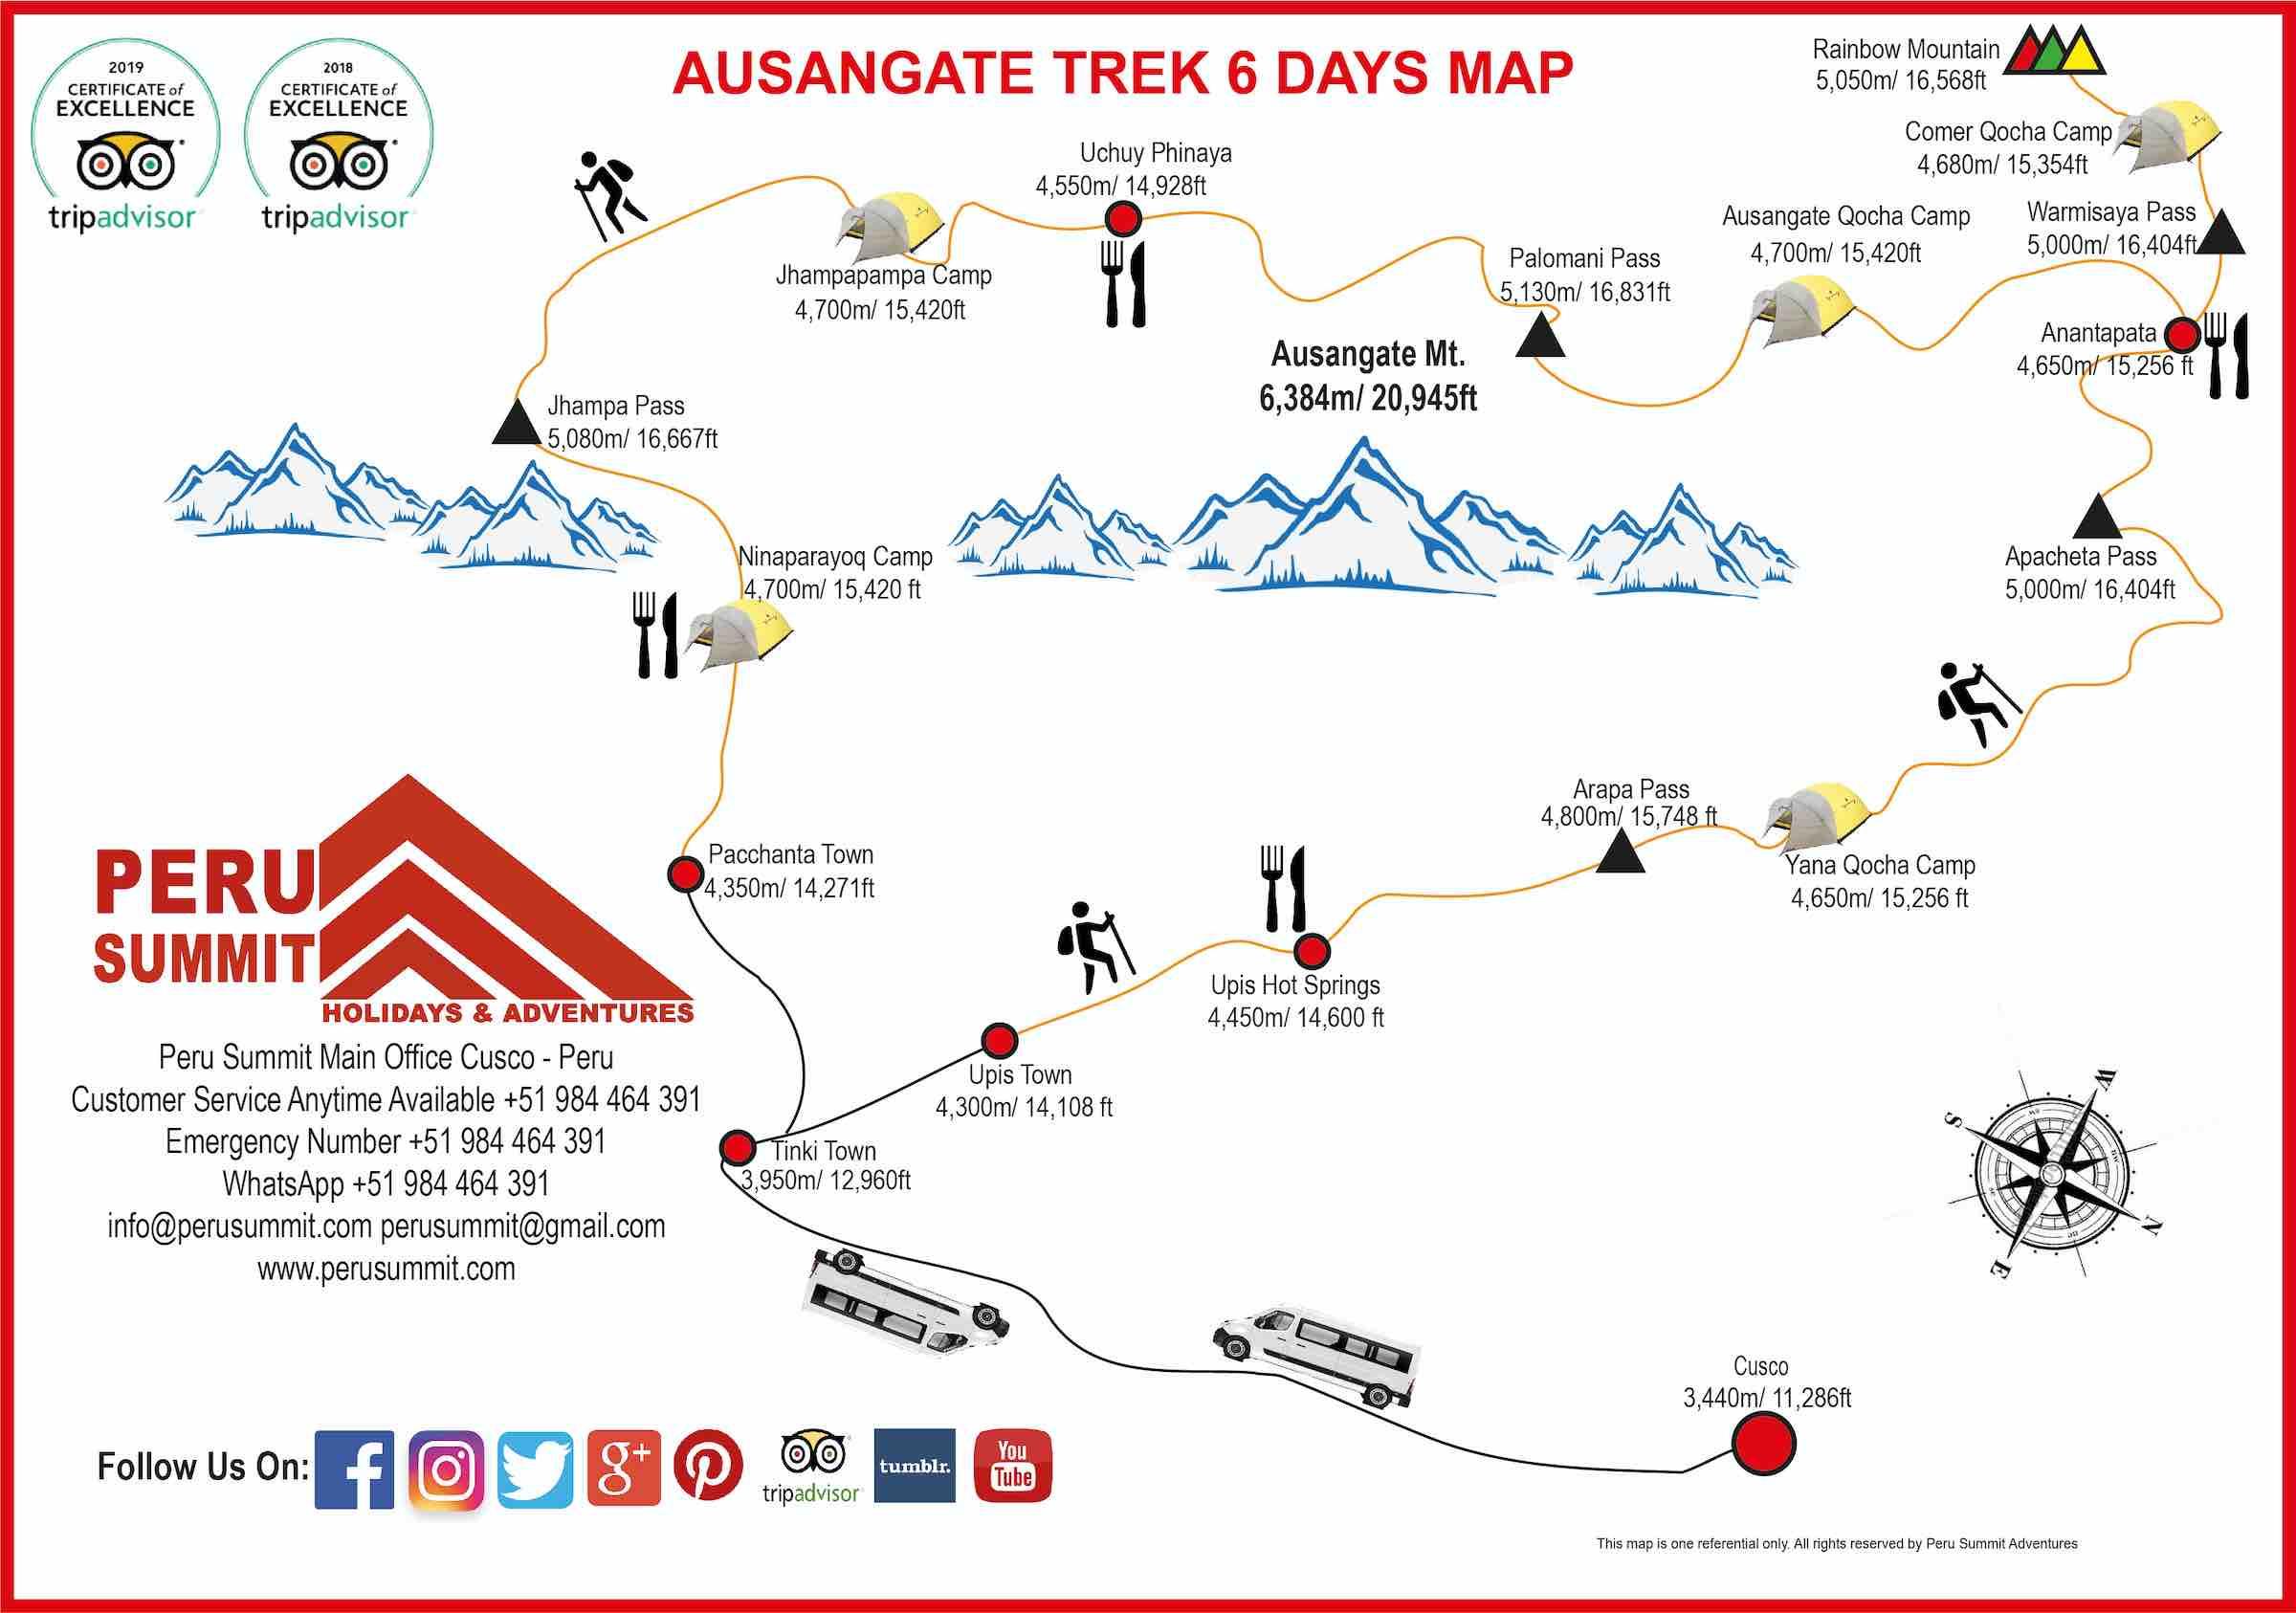 Ausangate and Rainbow Mountain Treks